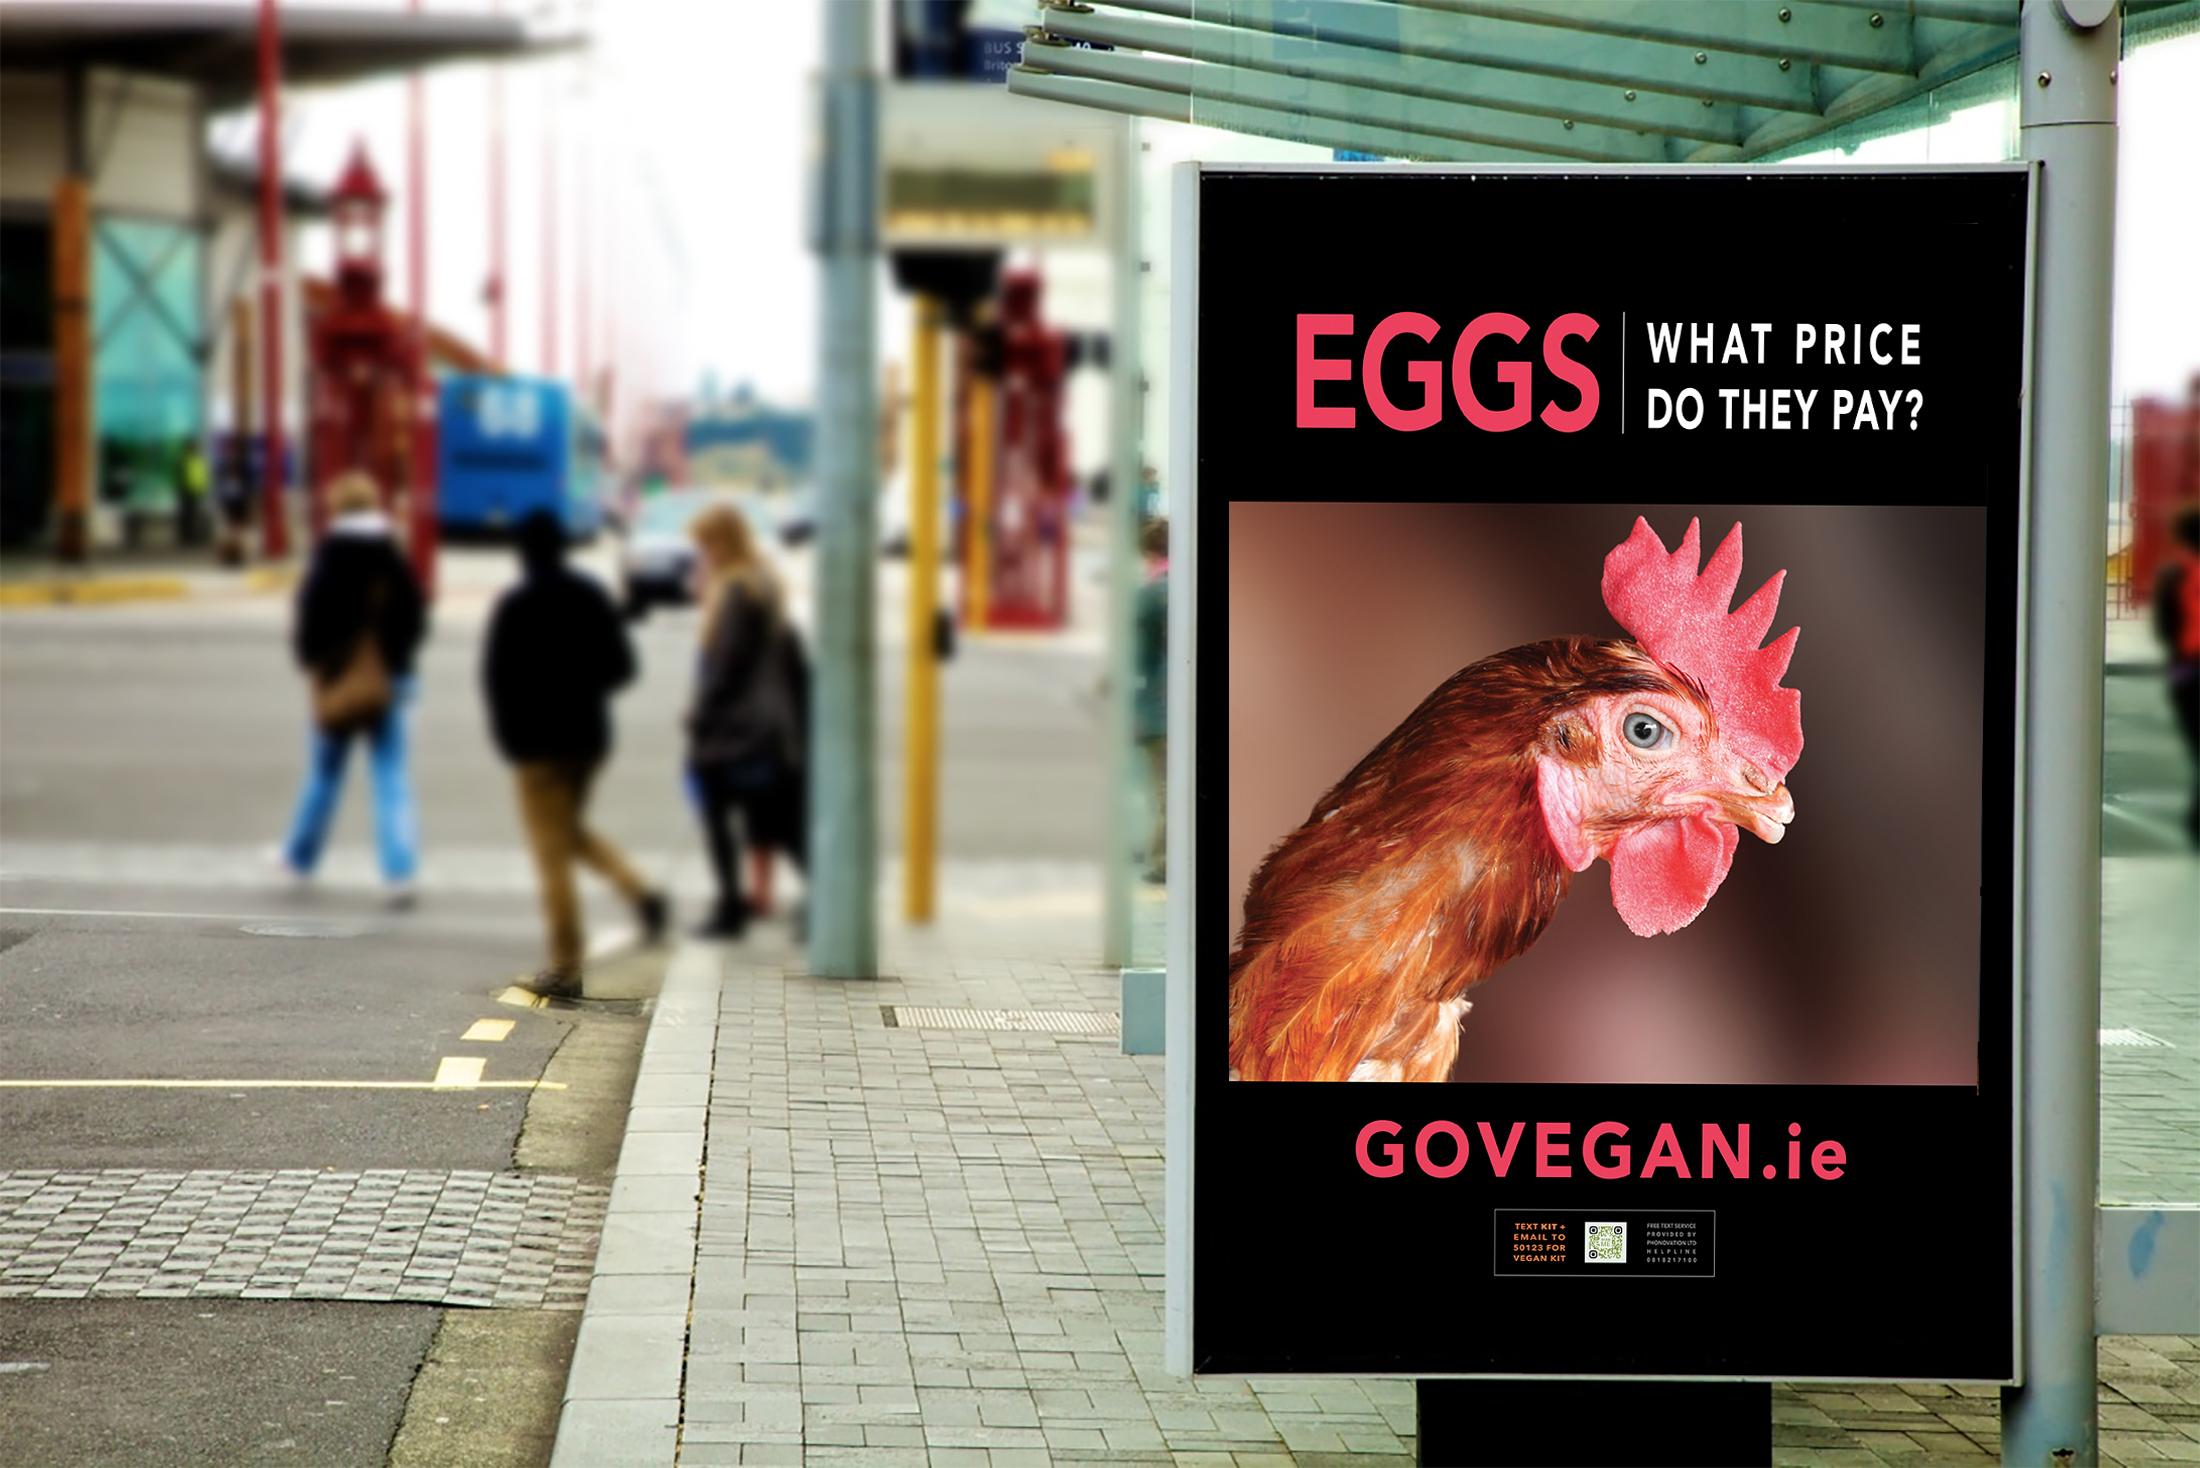 Bus-Eggs